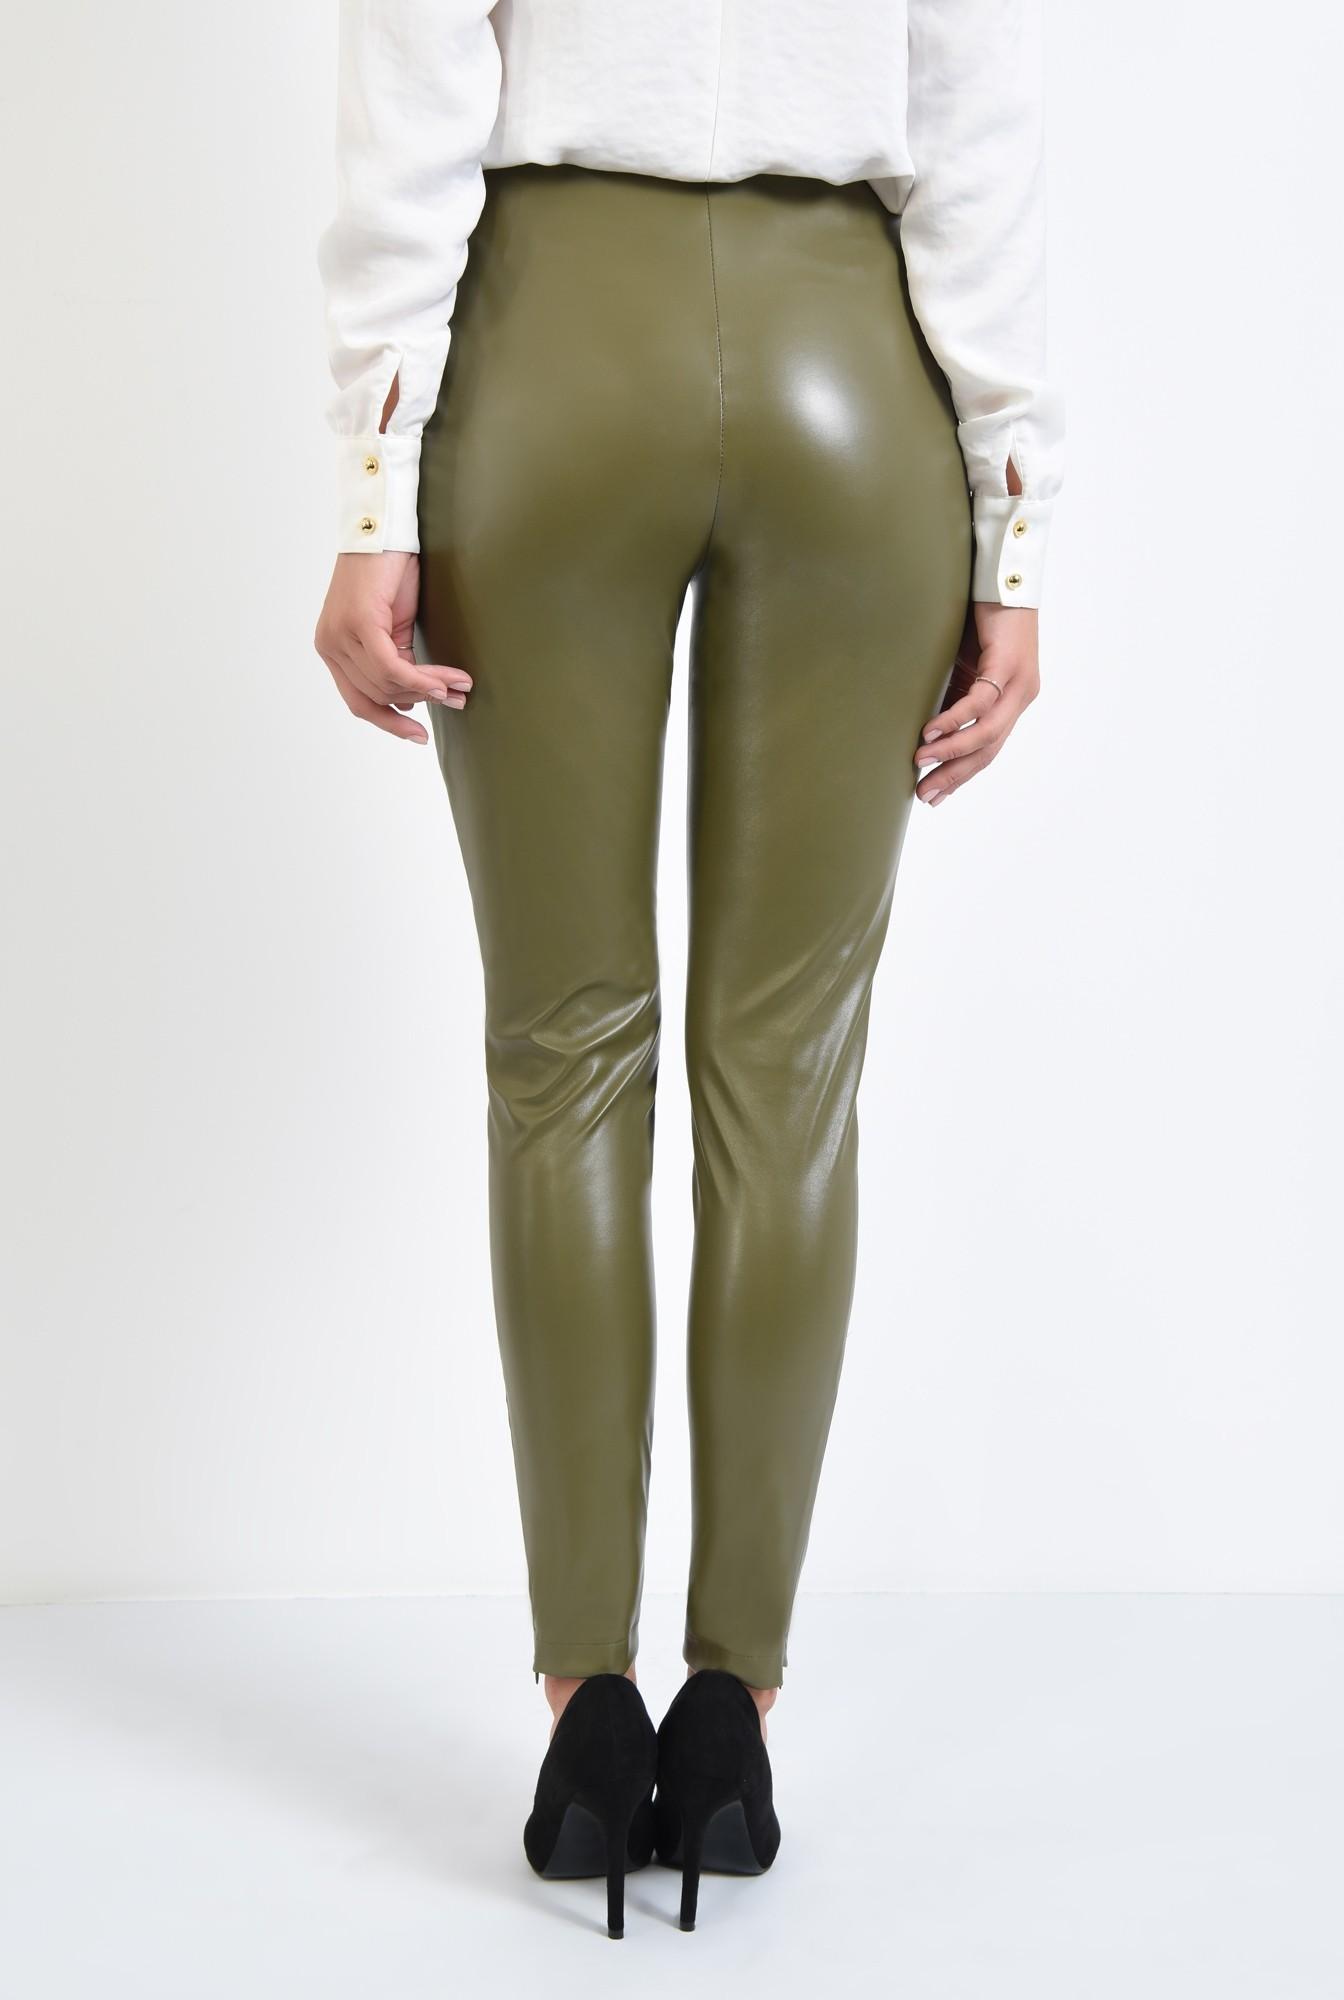 1 - pantaloni conici, kaki, fermoar la glezna, talie inalta fara betelie